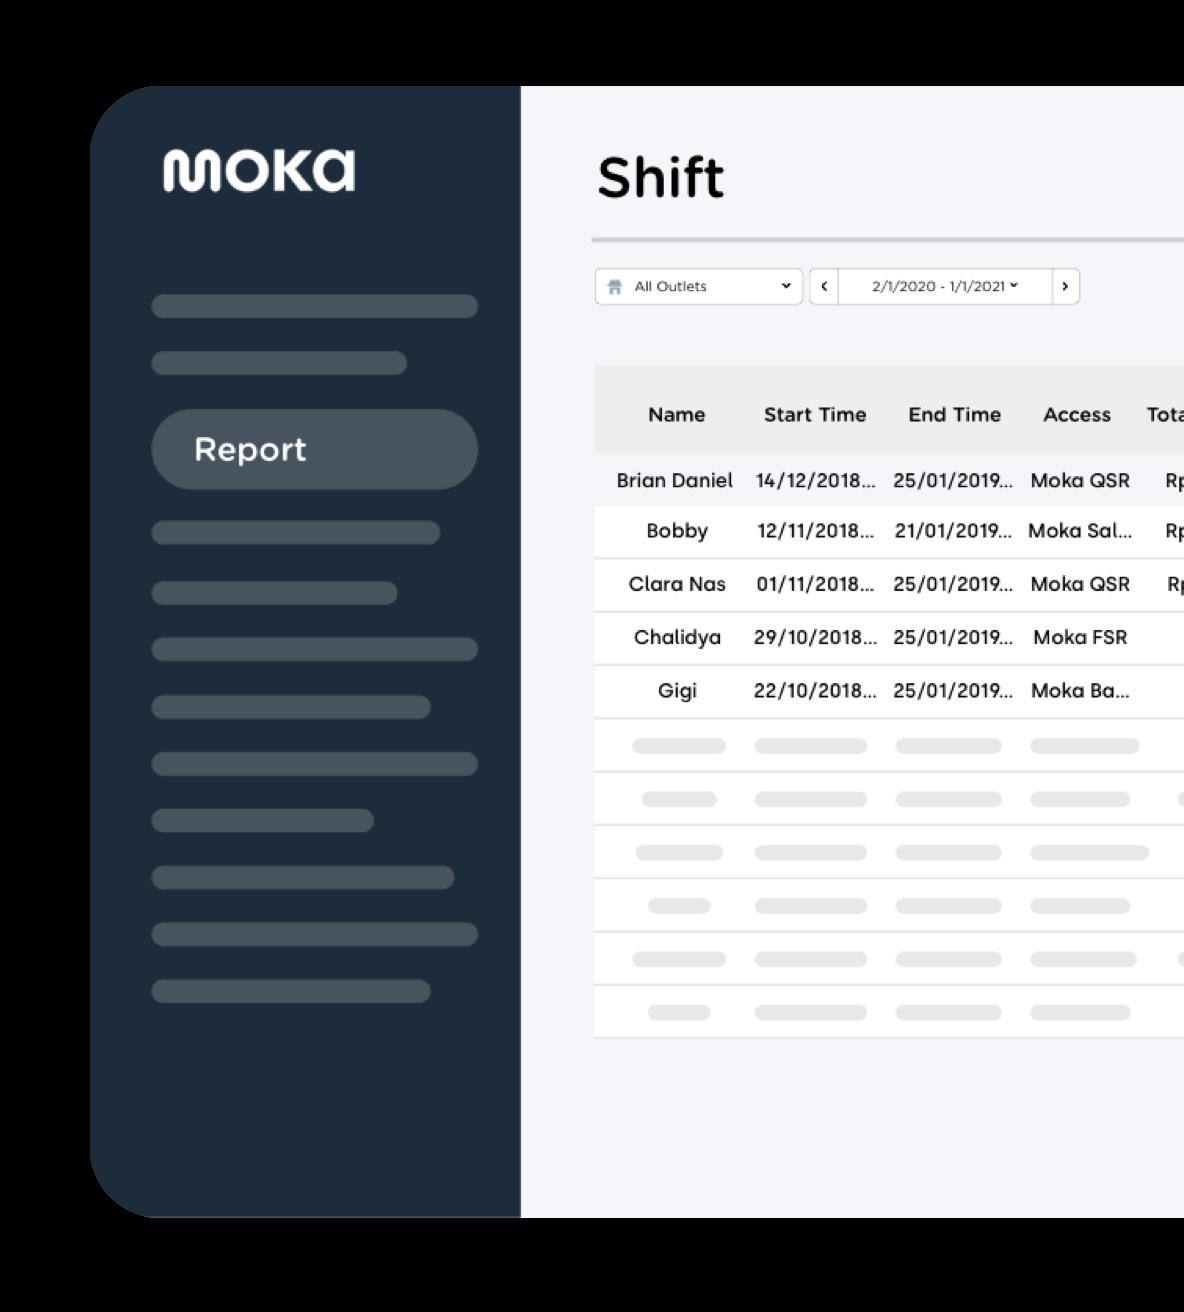 Aplikasi point of sale Moka yang mengamankan dan mengelola data karyawan, serta untuk memonitor sif kerja karyawan yang bertugas